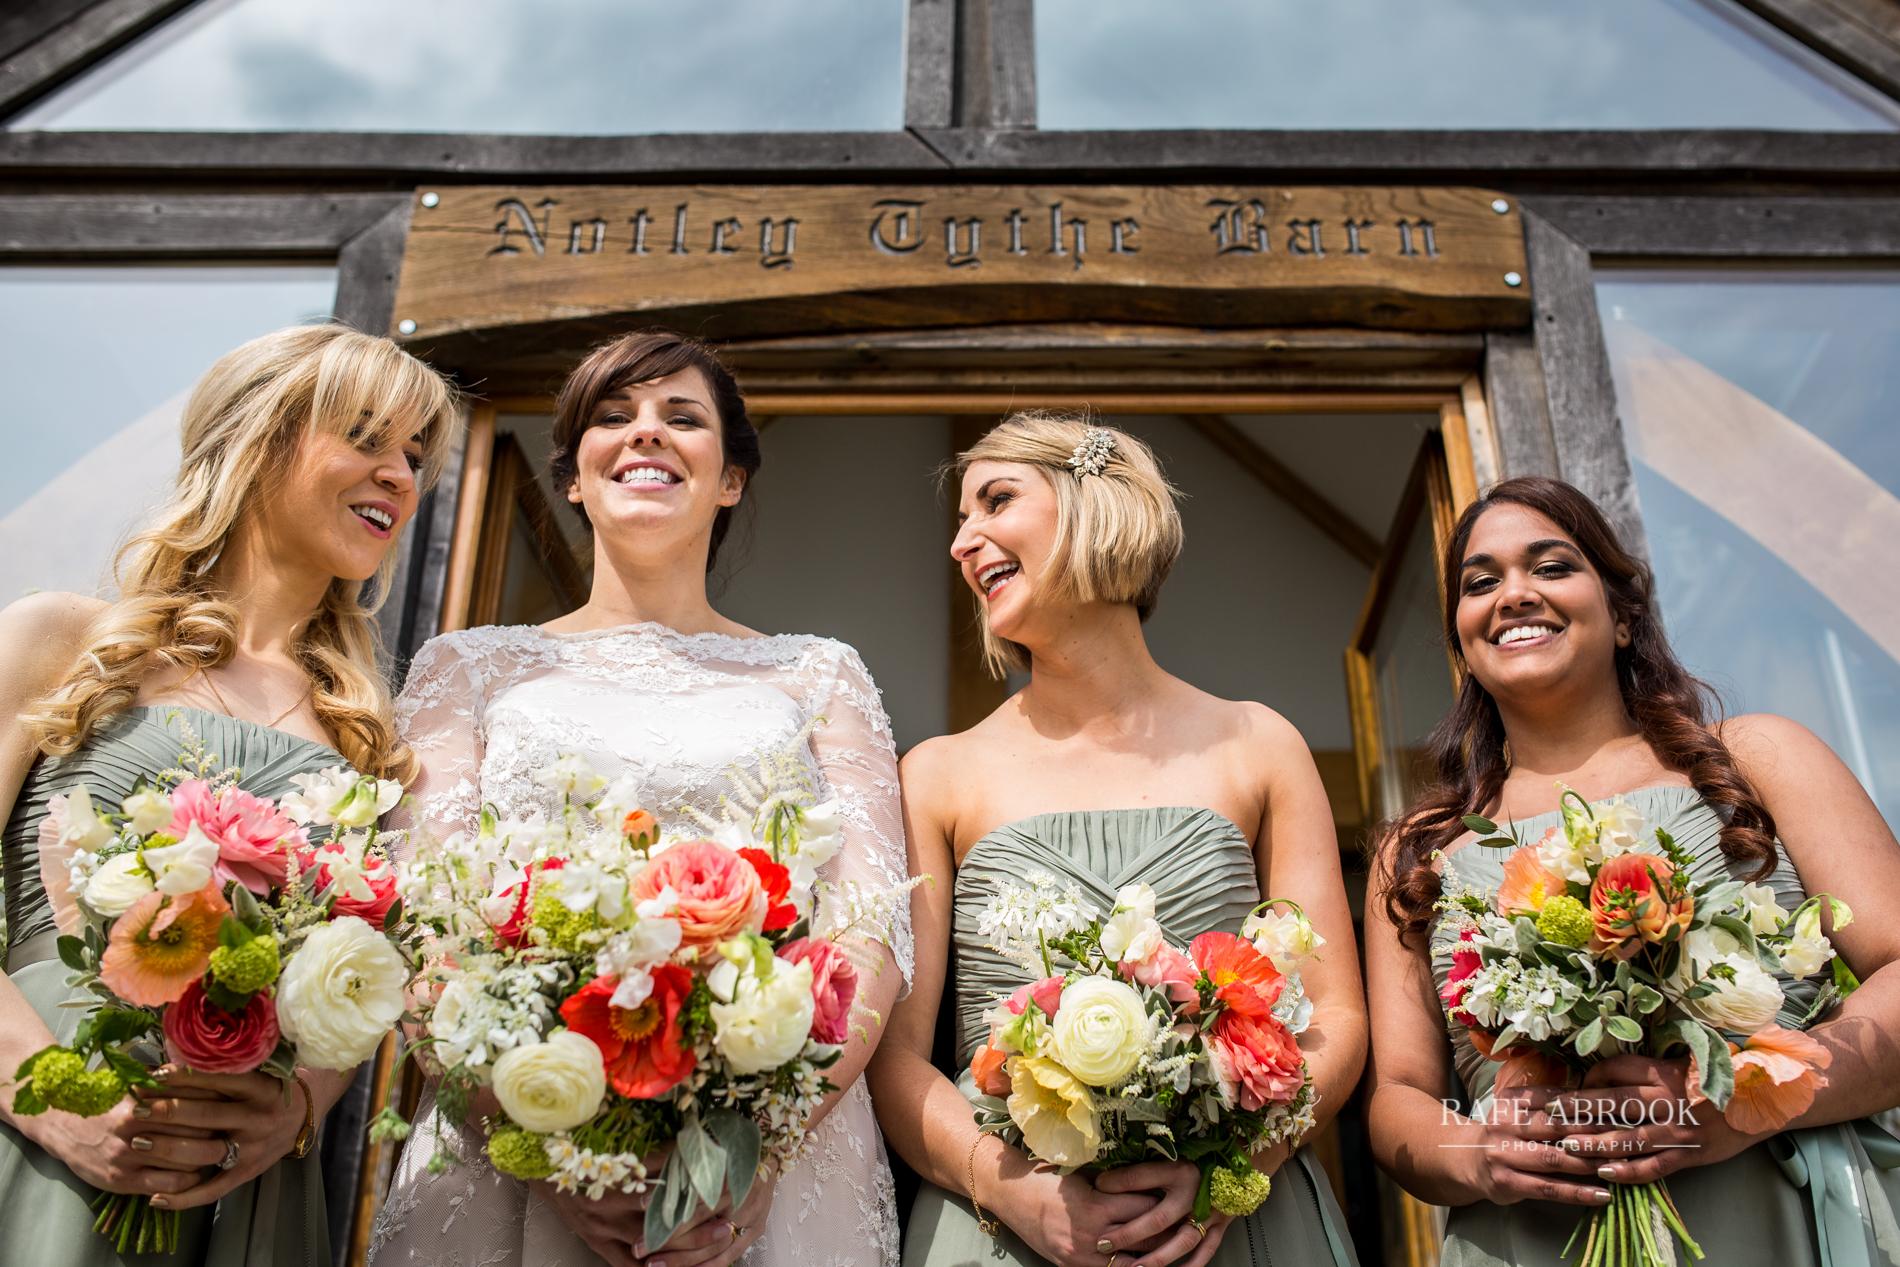 jon & laura wedding notley tythe barn wedding buckinghamshire-1291.jpg